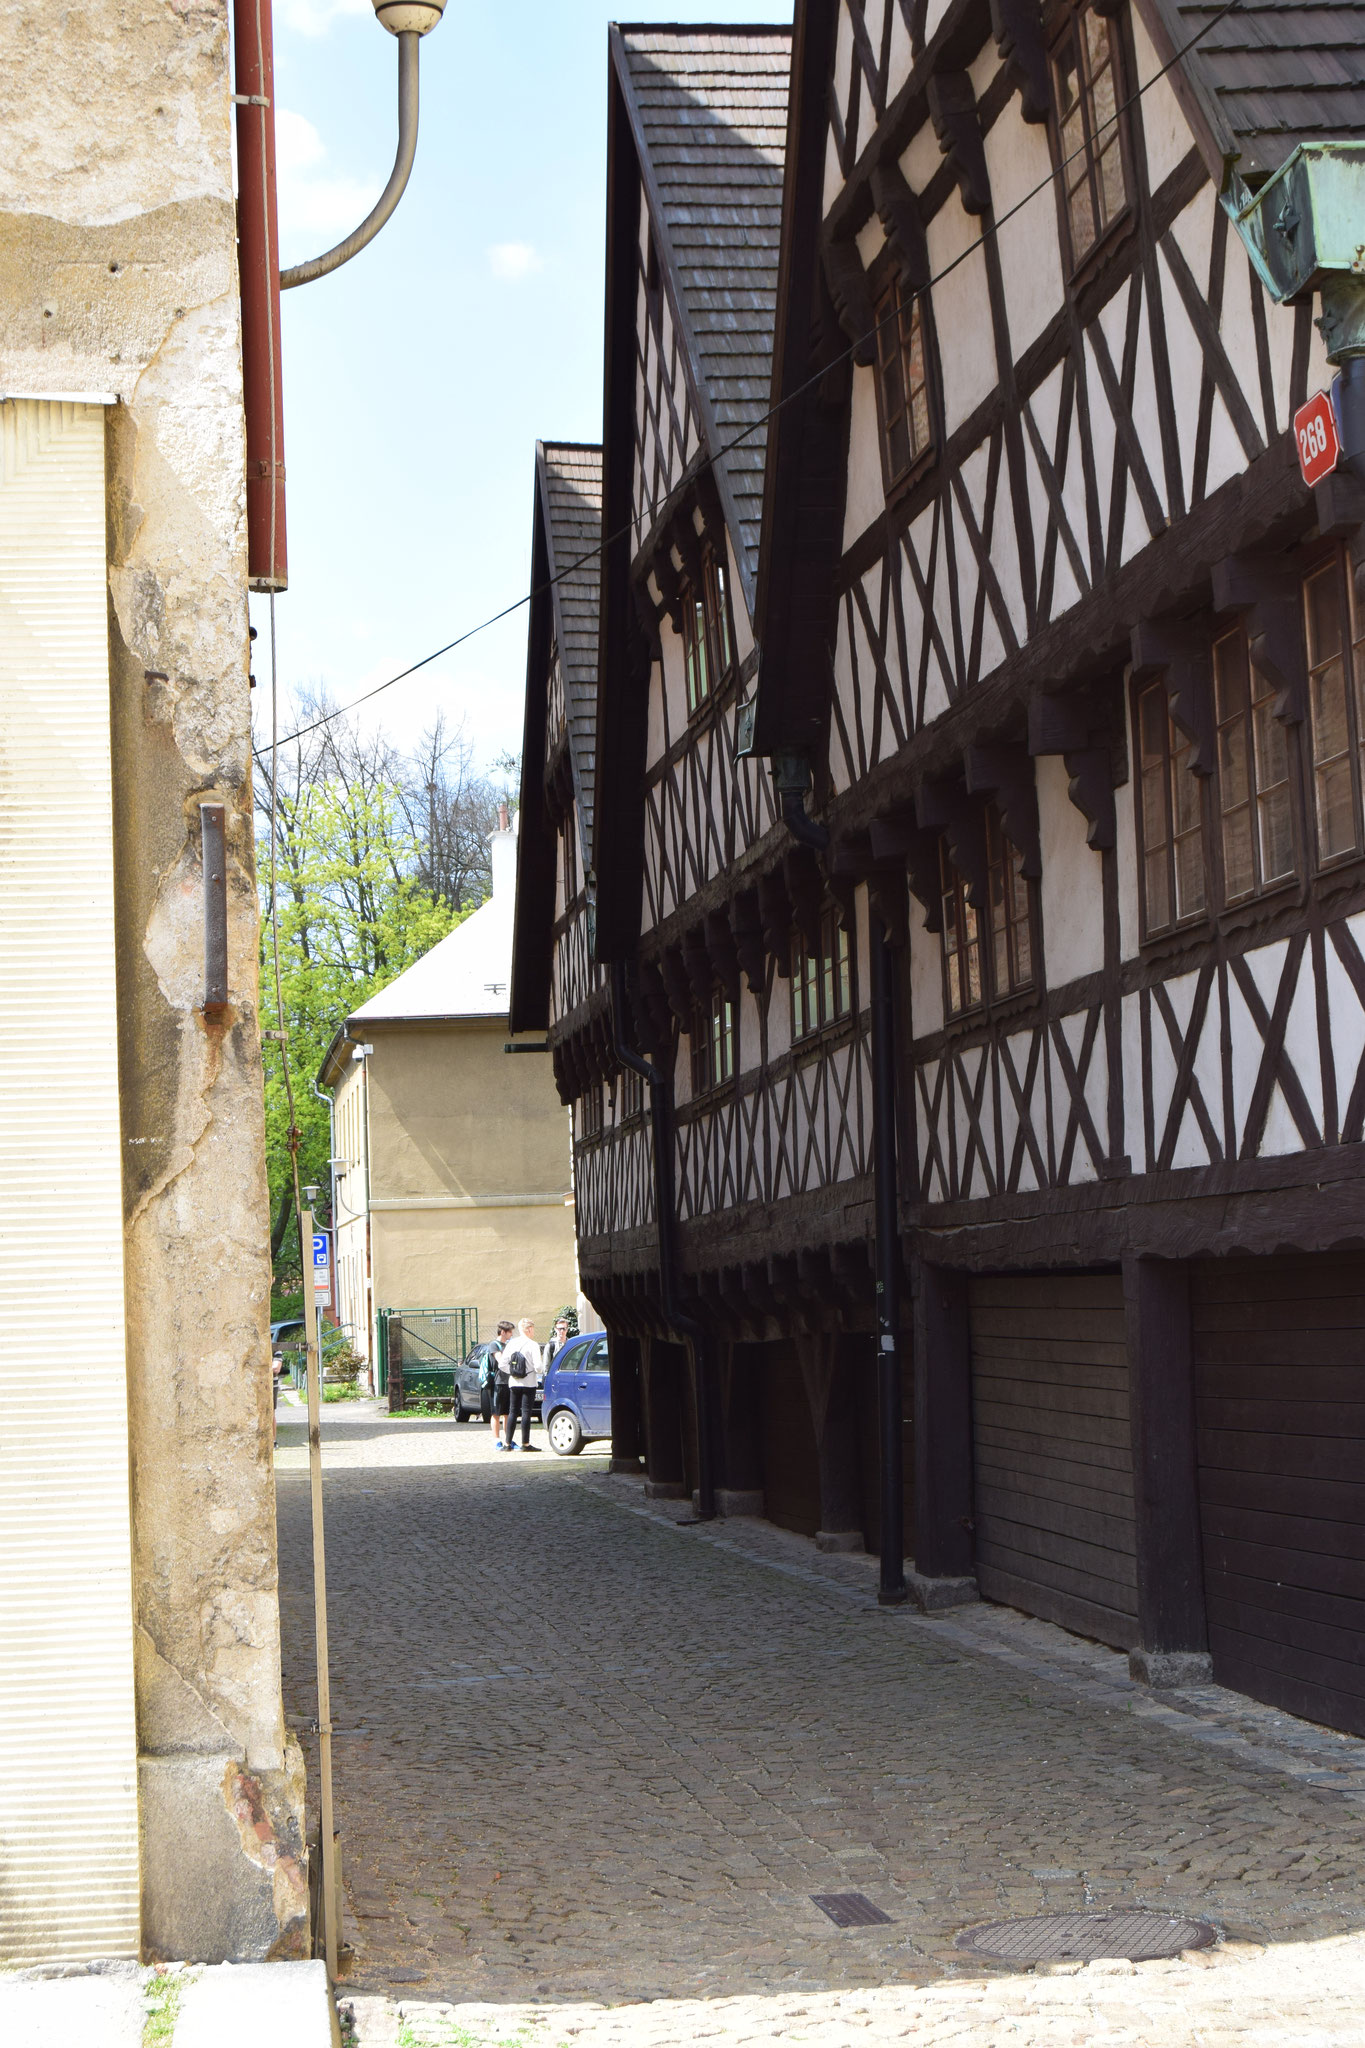 Liberec: Wallensteinhäuser 1678-1681